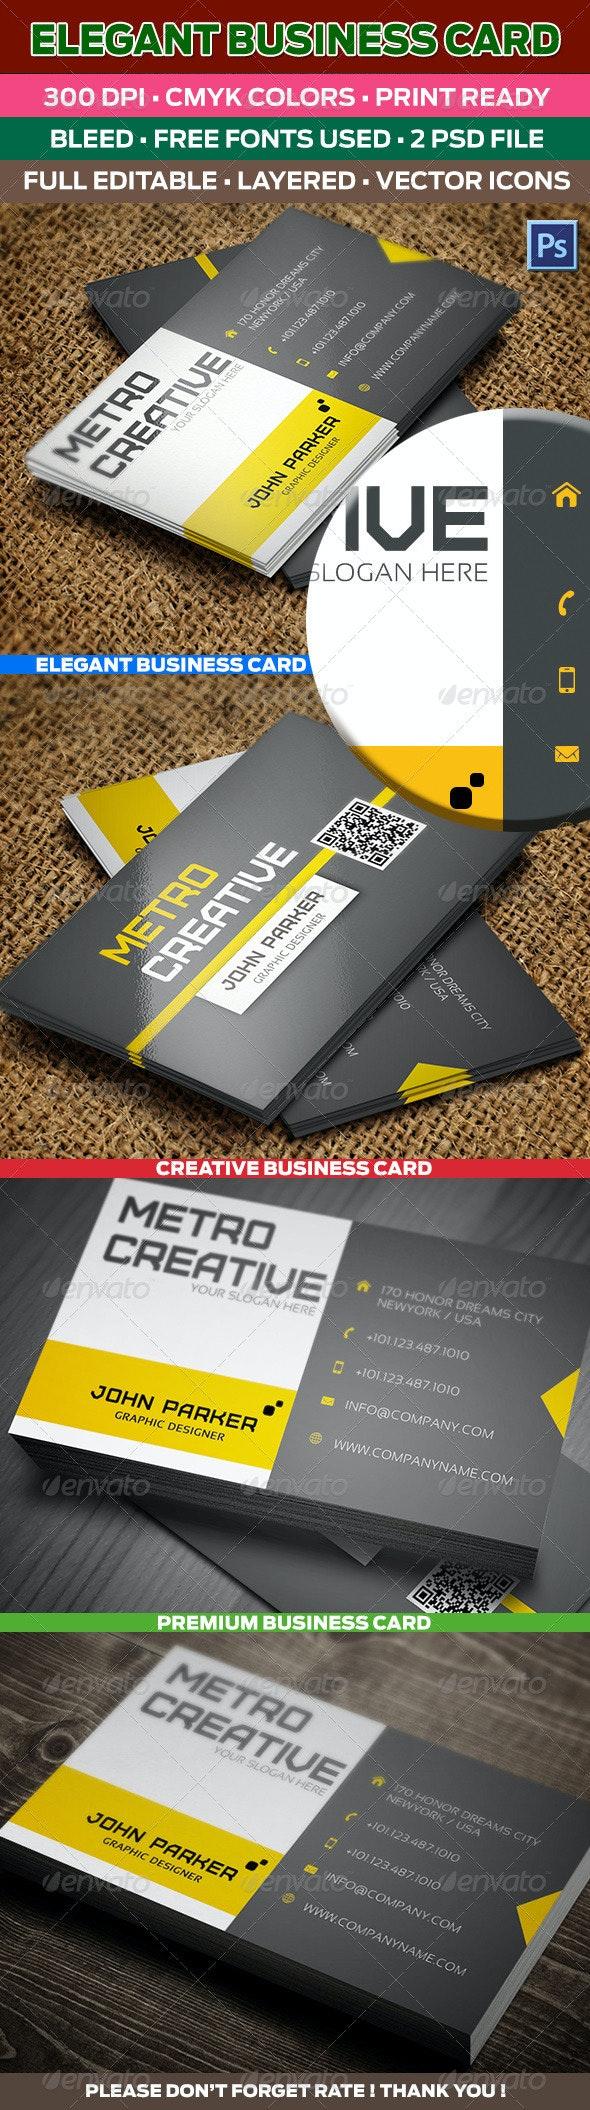 Creative Business Card 70 - Creative Business Cards